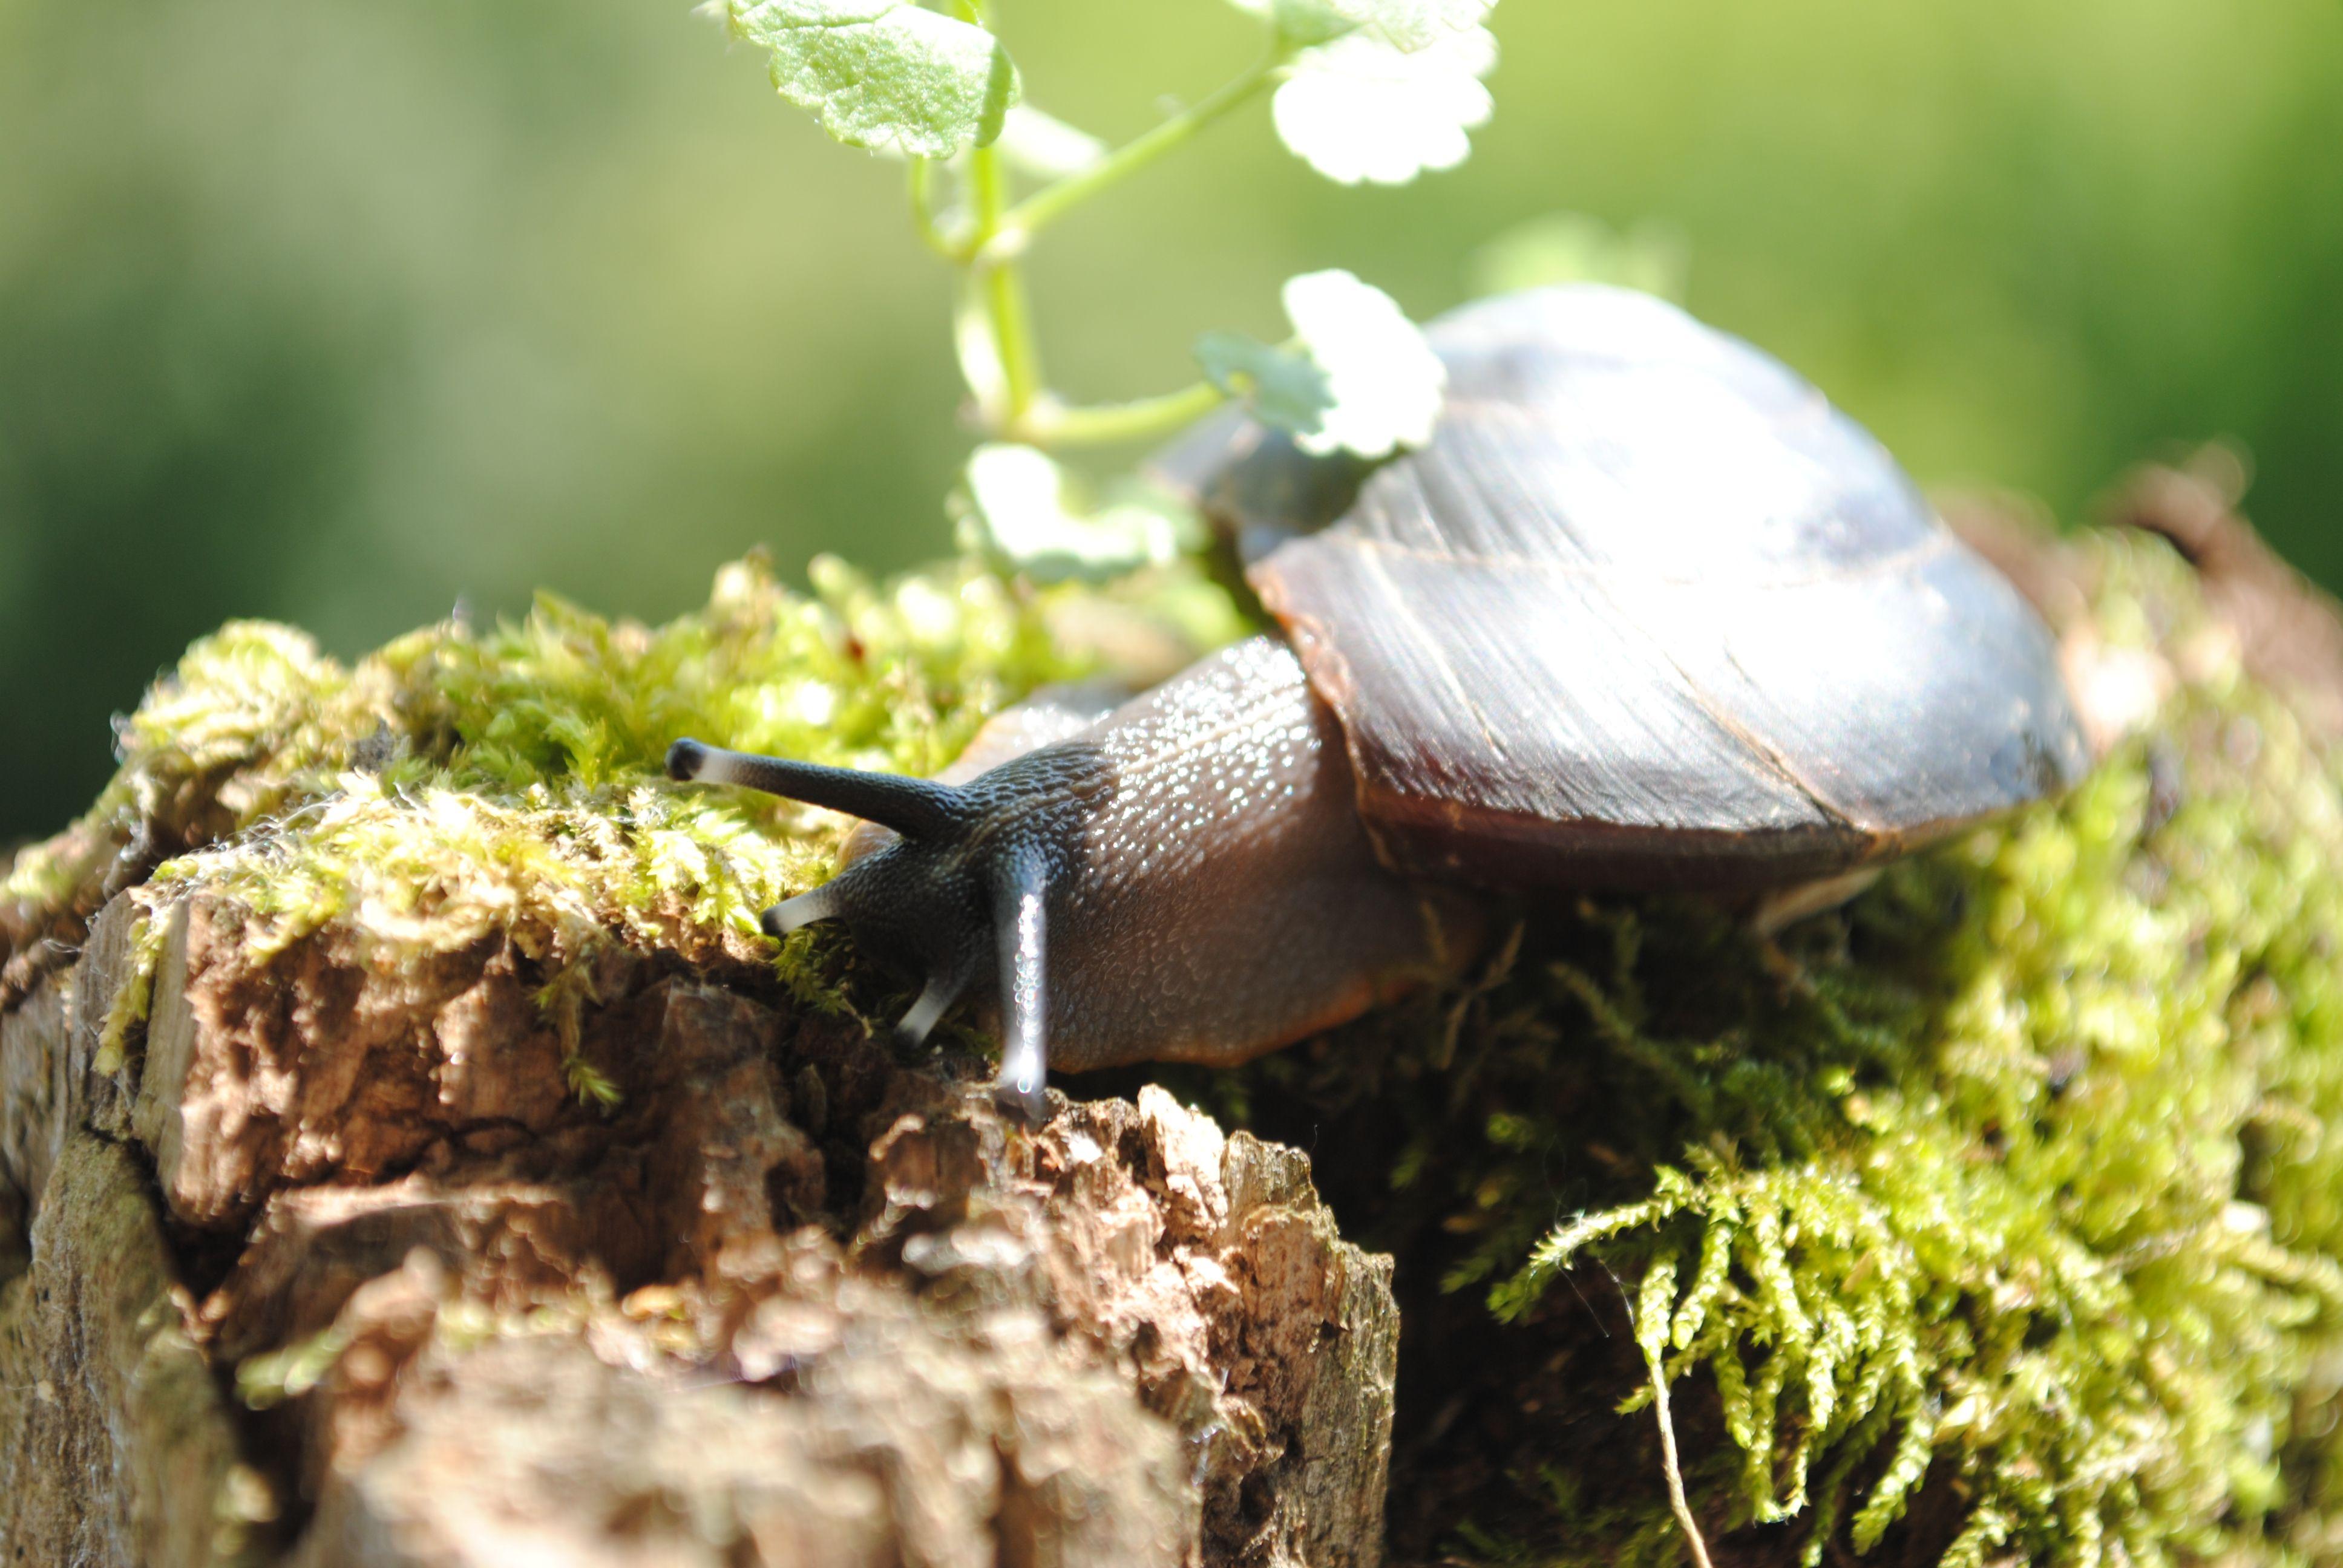 The Caracolus Snail